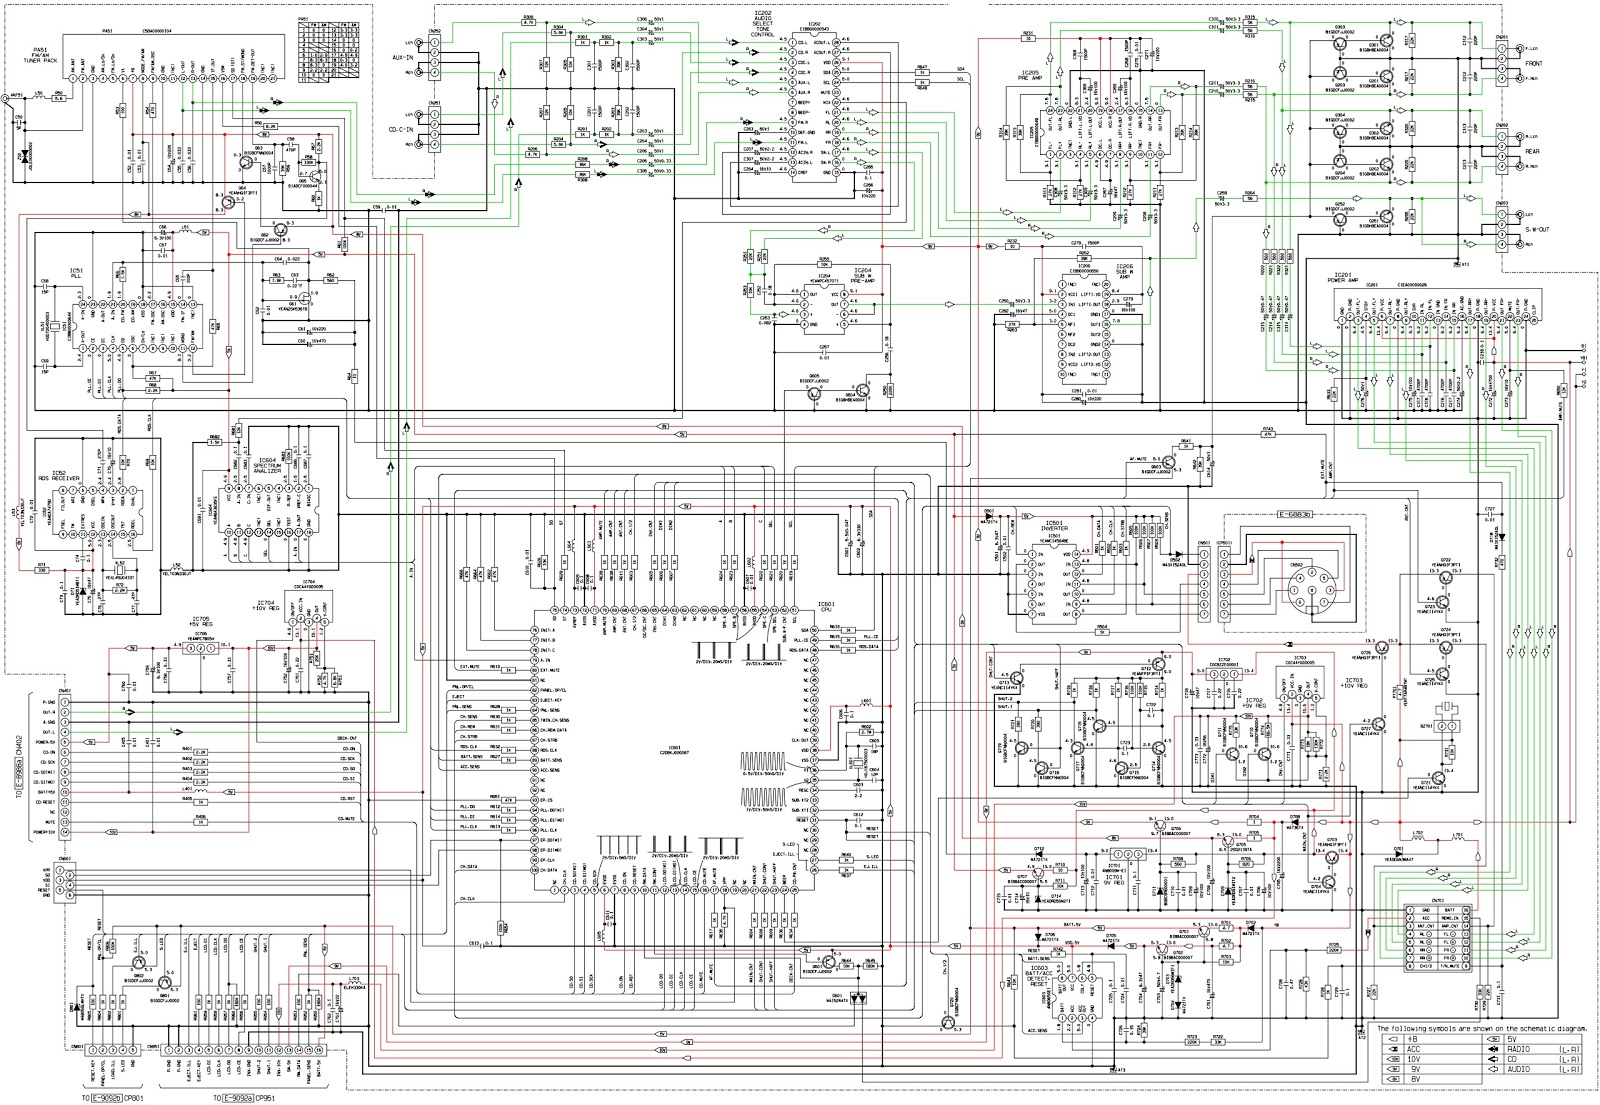 47 Quot Lg Scarlet Tv Wiring Diagram